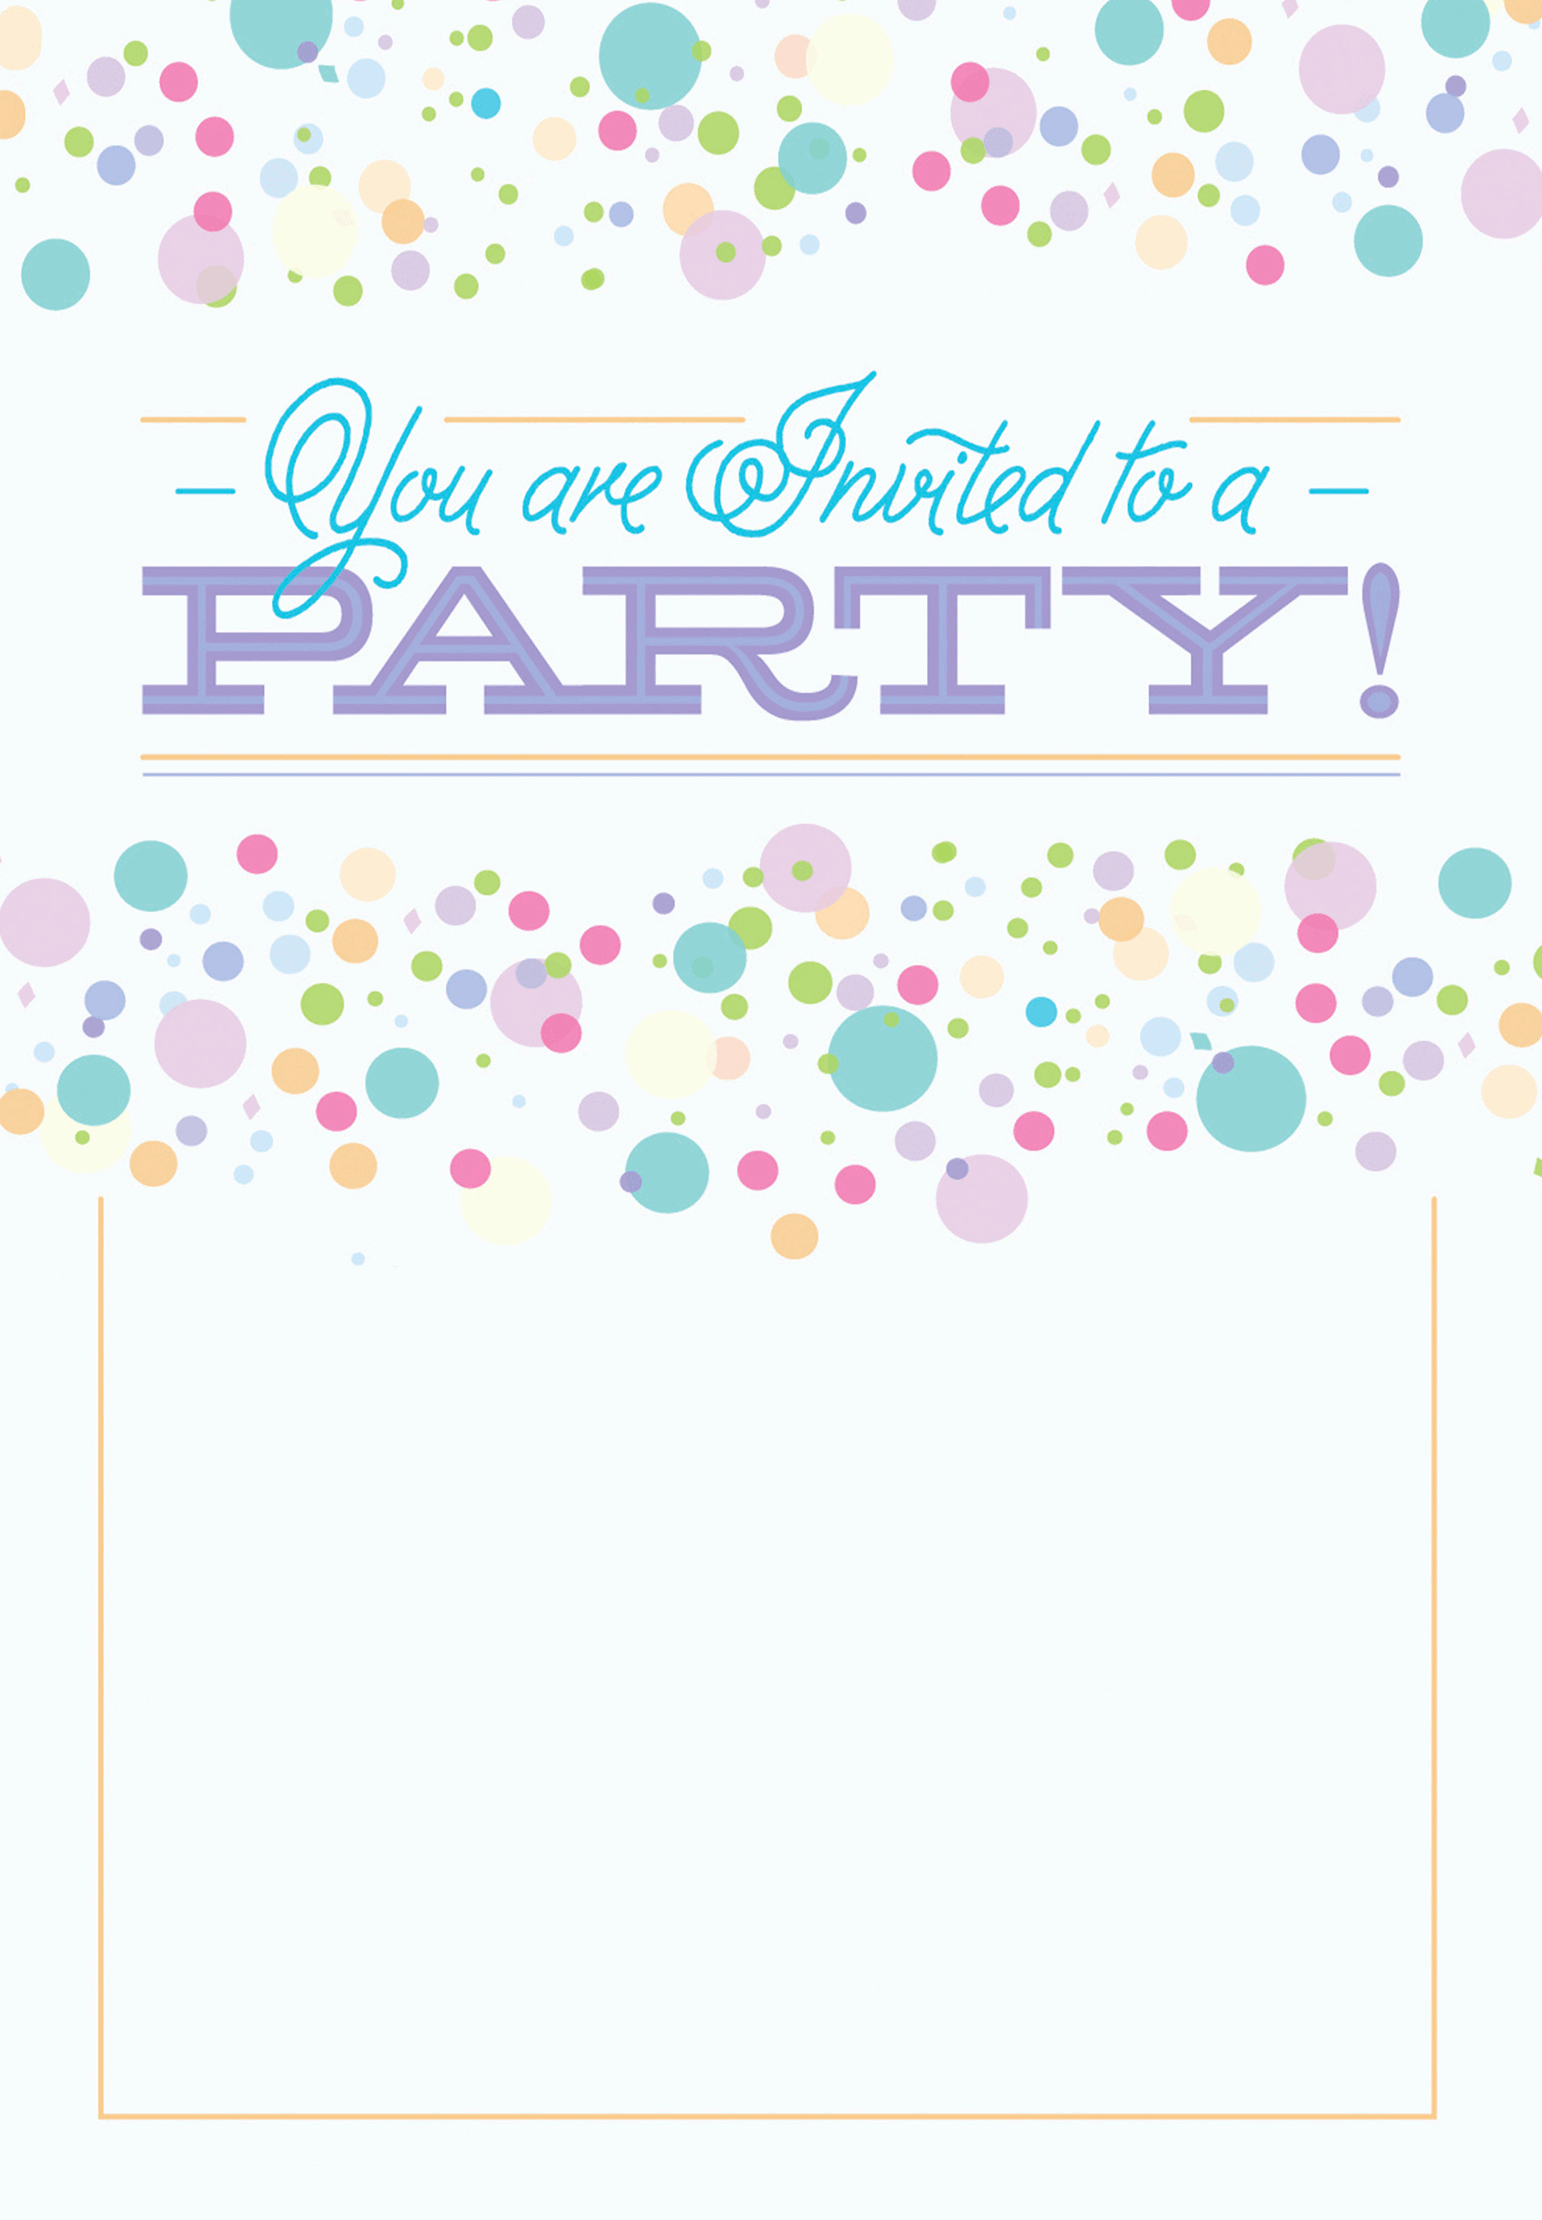 Free Party Invitation Templates Luxury Polka Dots Free Printable Party Invitation Template